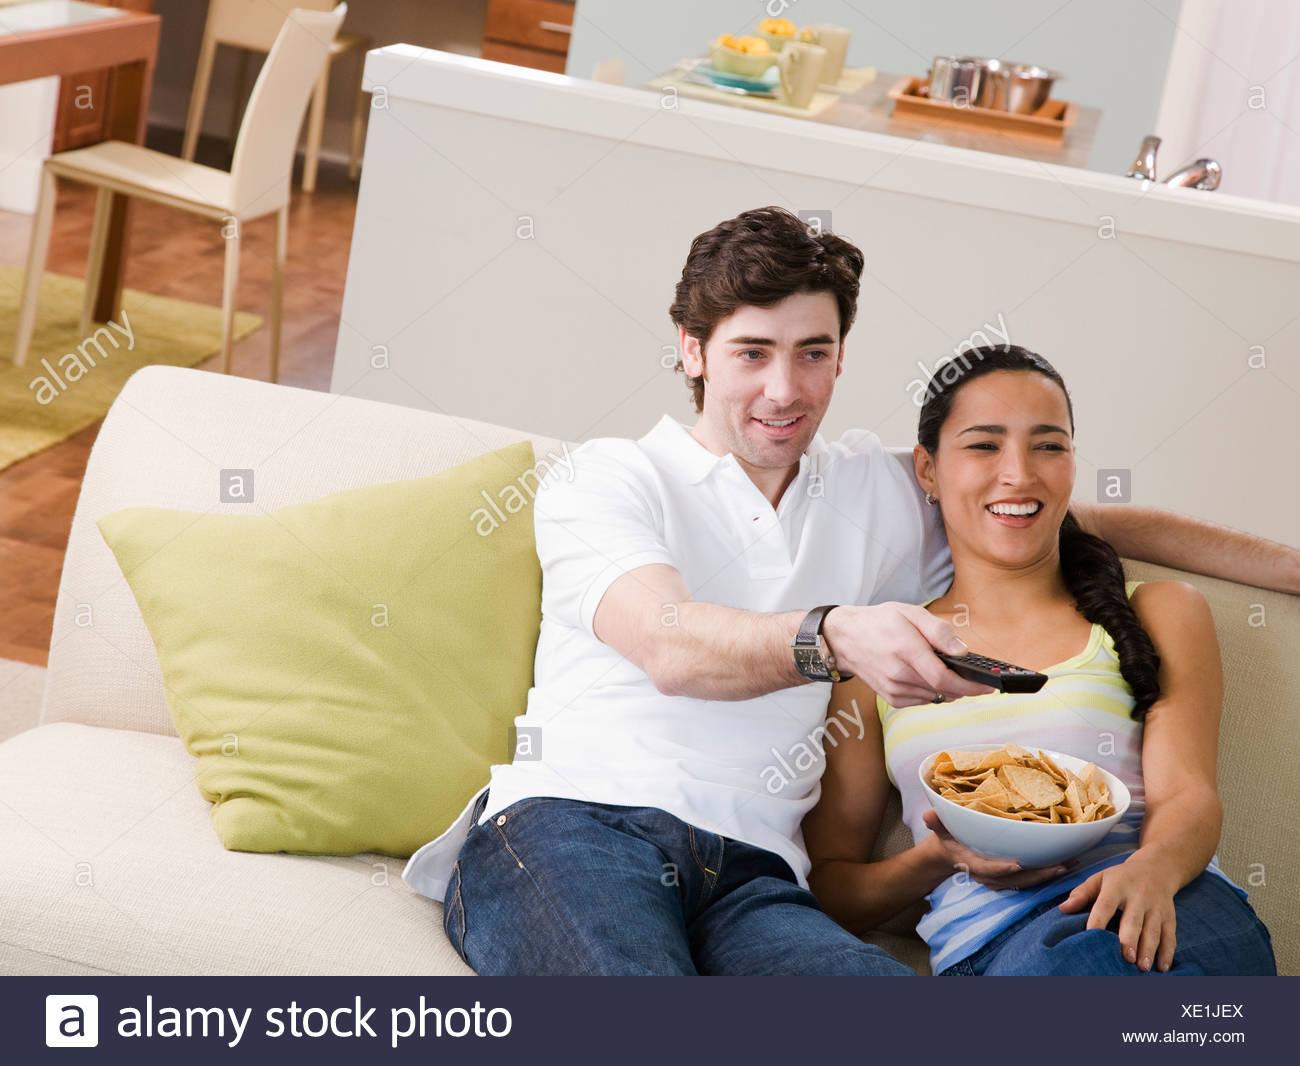 couch potato woman stock photos couch potato woman stock. Black Bedroom Furniture Sets. Home Design Ideas